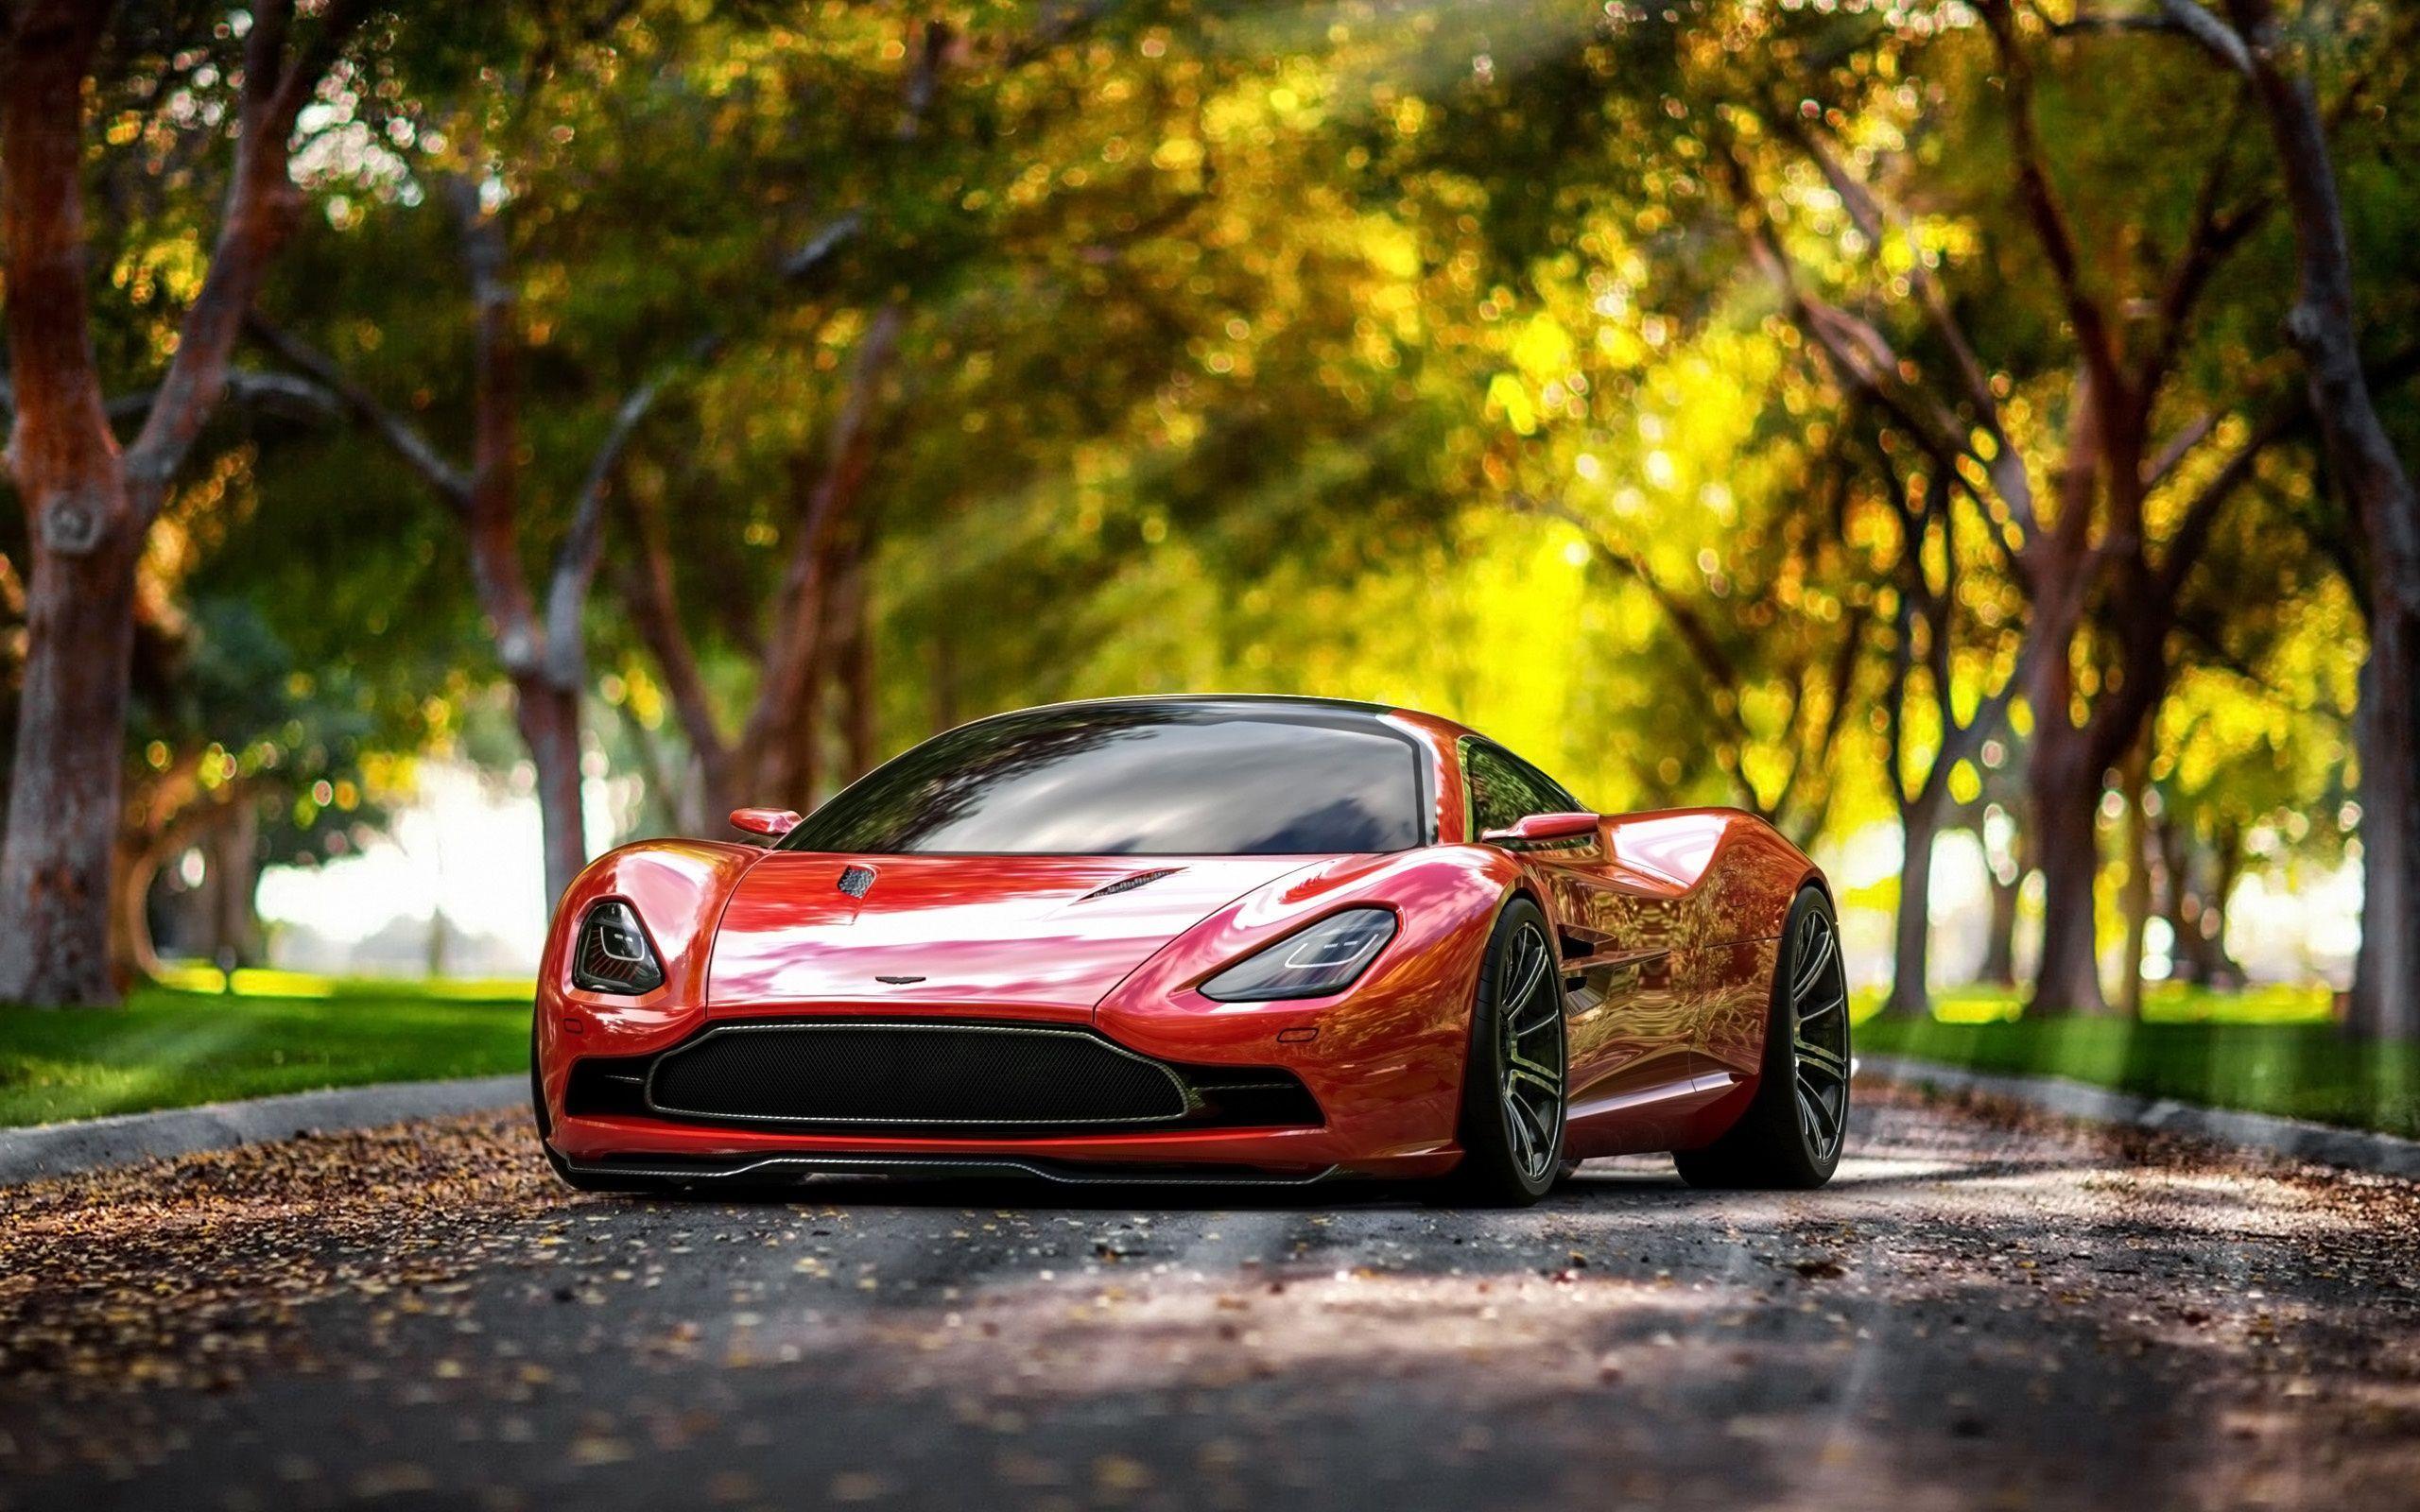 68 best free ultra hd car wallpapers - wallpaperaccess